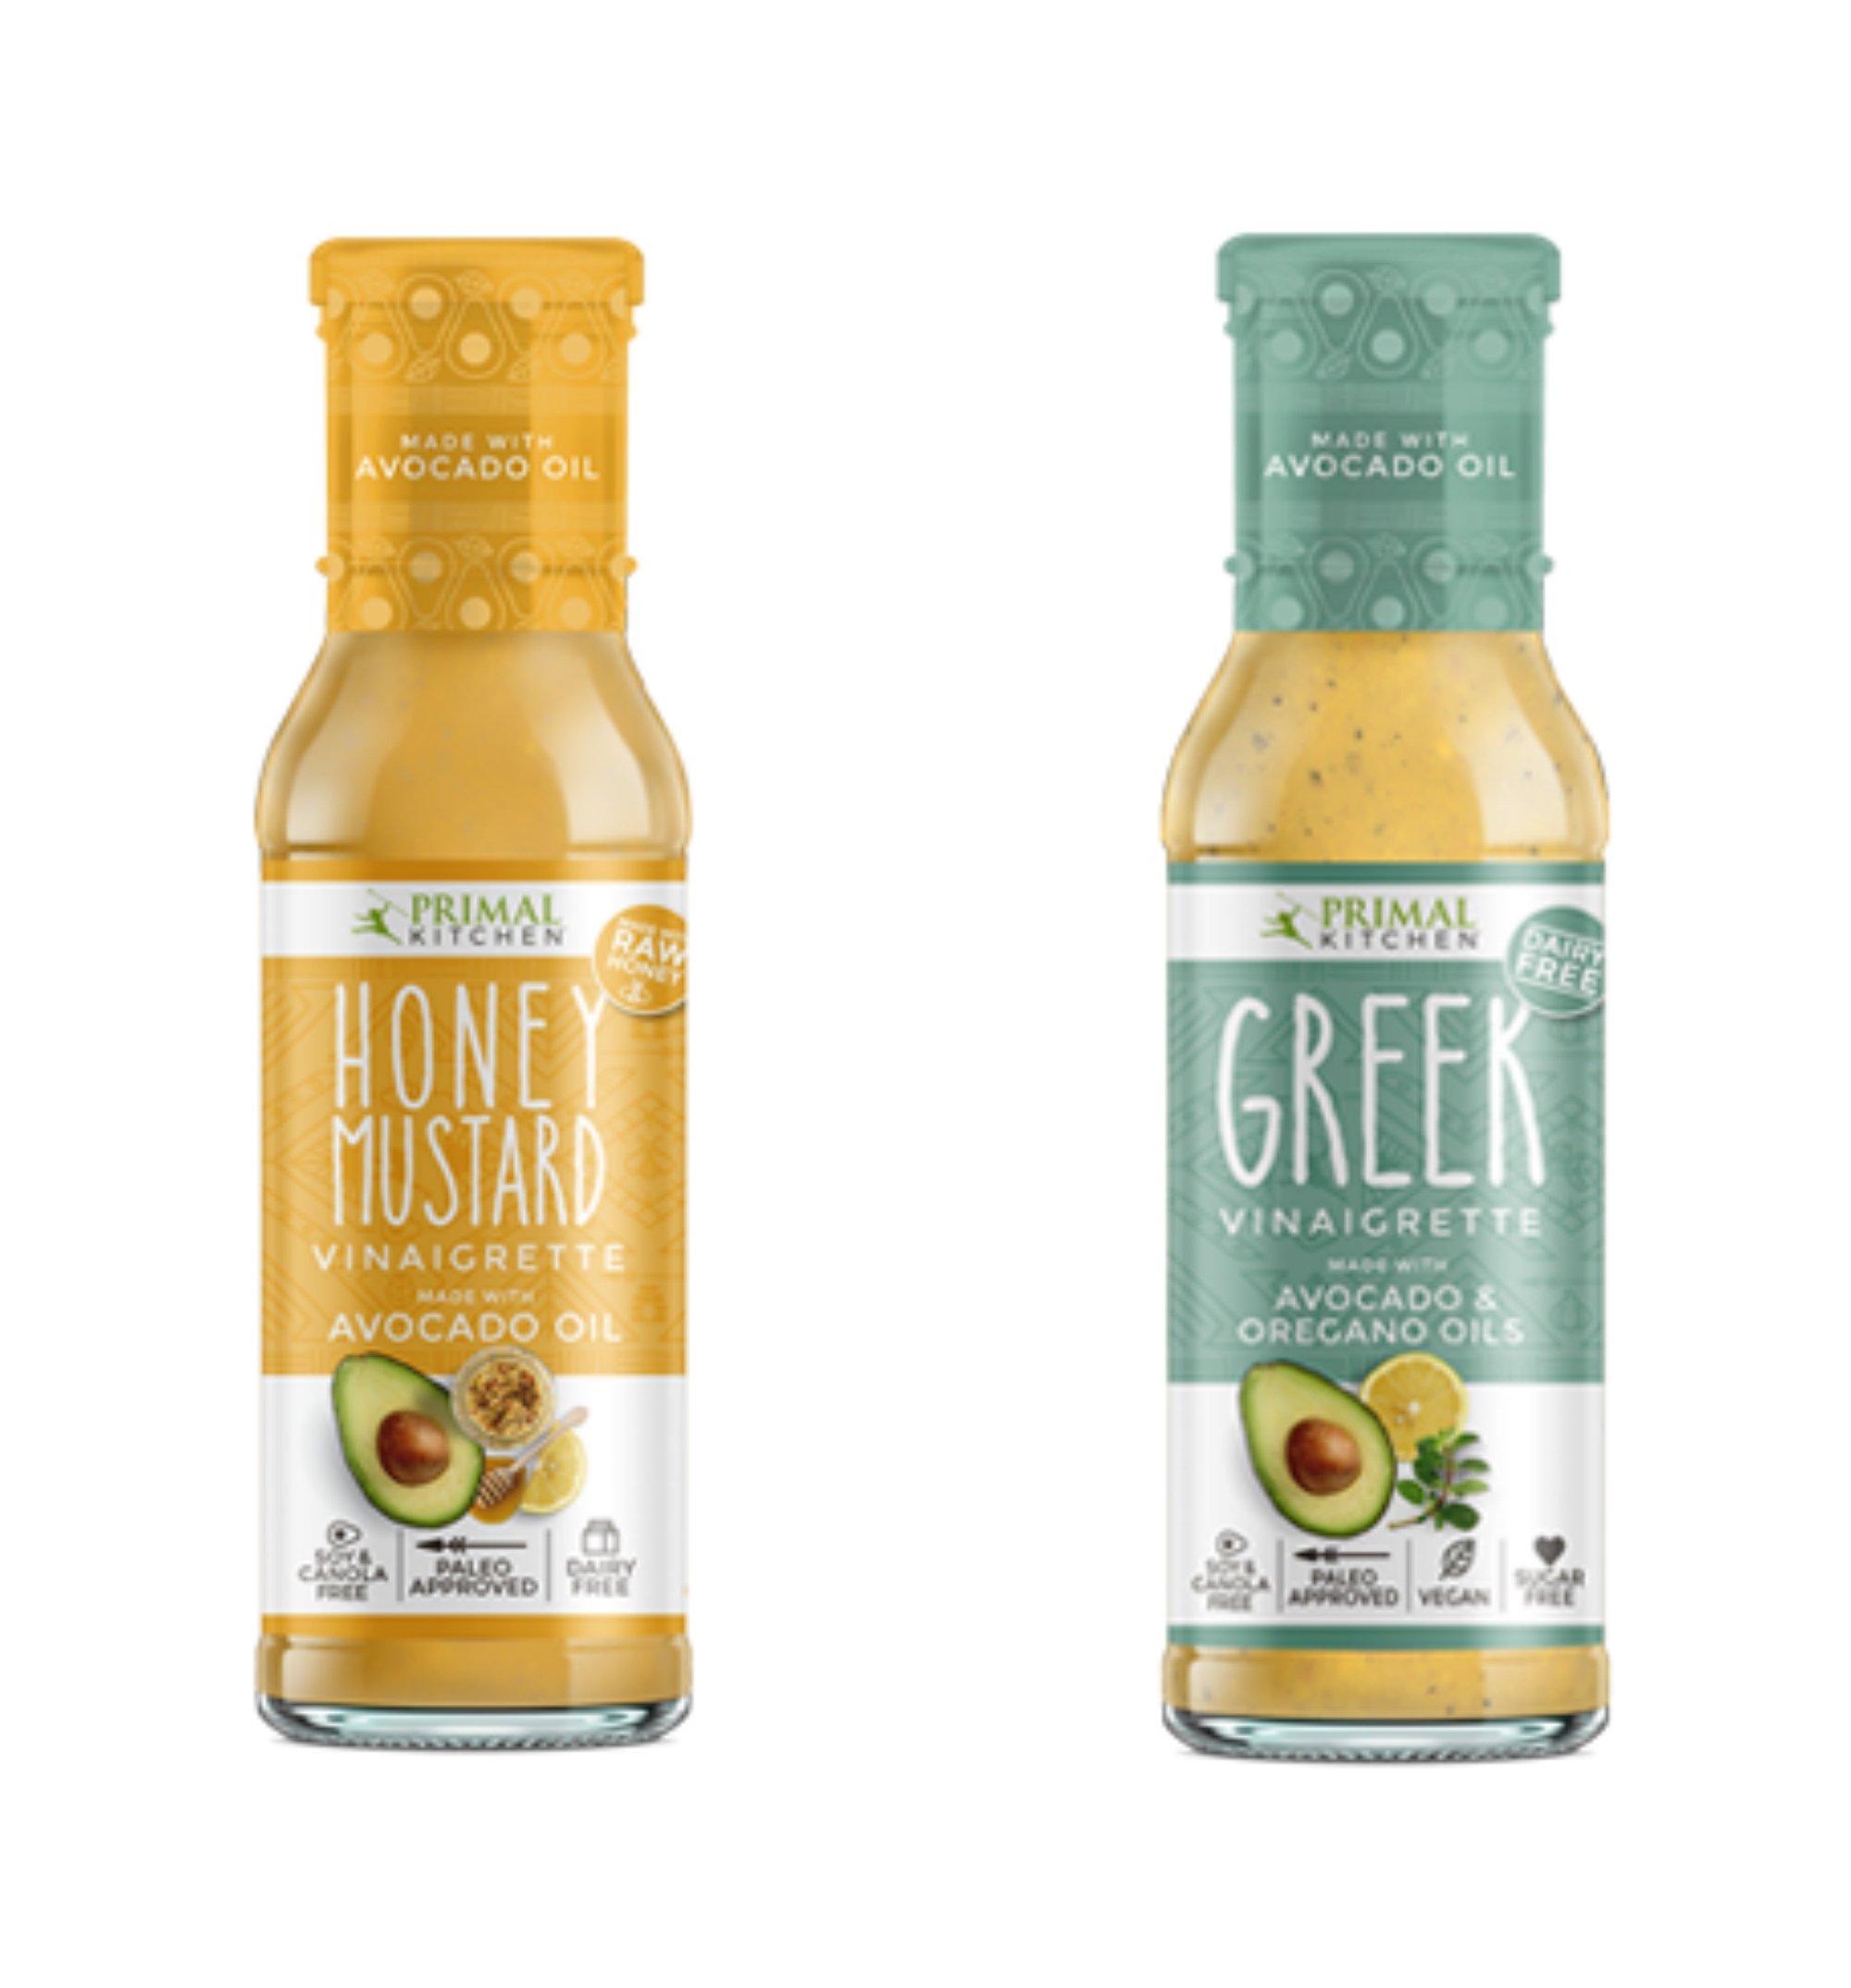 Amazon.com : Primal Kitchen - Paleo Approved Avocado Oil Mayo, 12 Oz ...